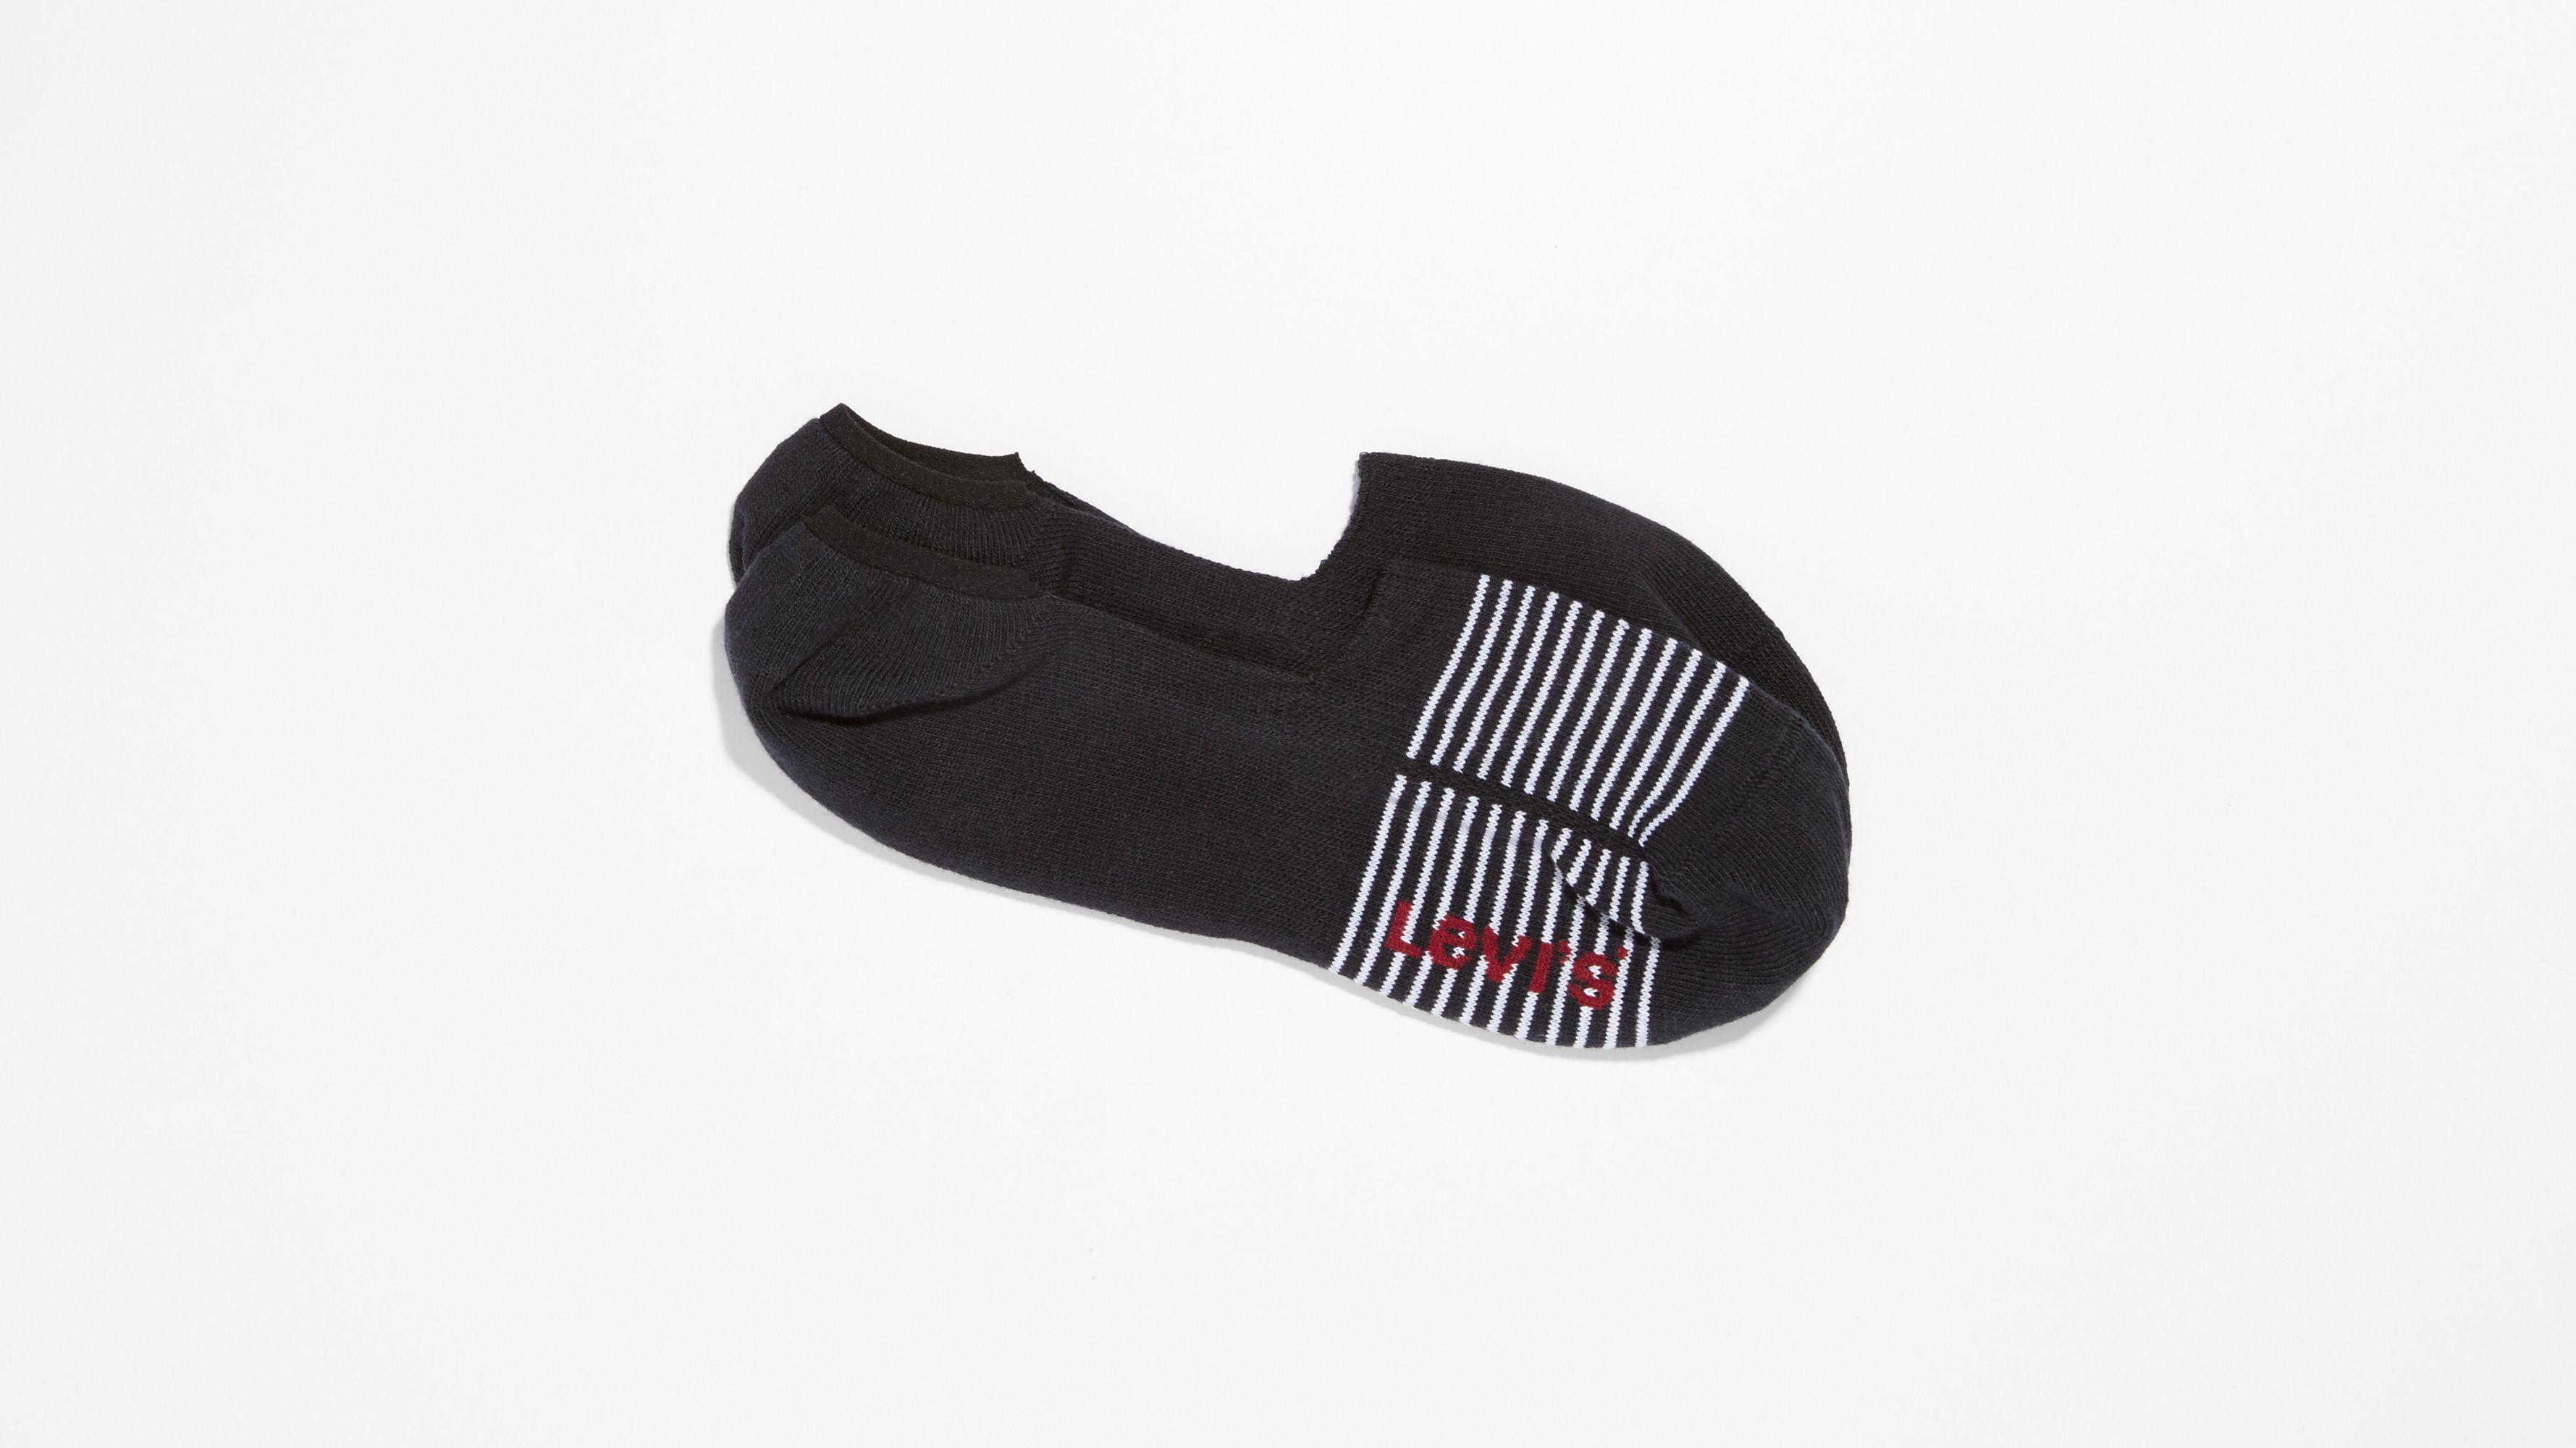 47f0235ce6 Levi's® 2 Pack No Show Socks - Black | Levi's® US